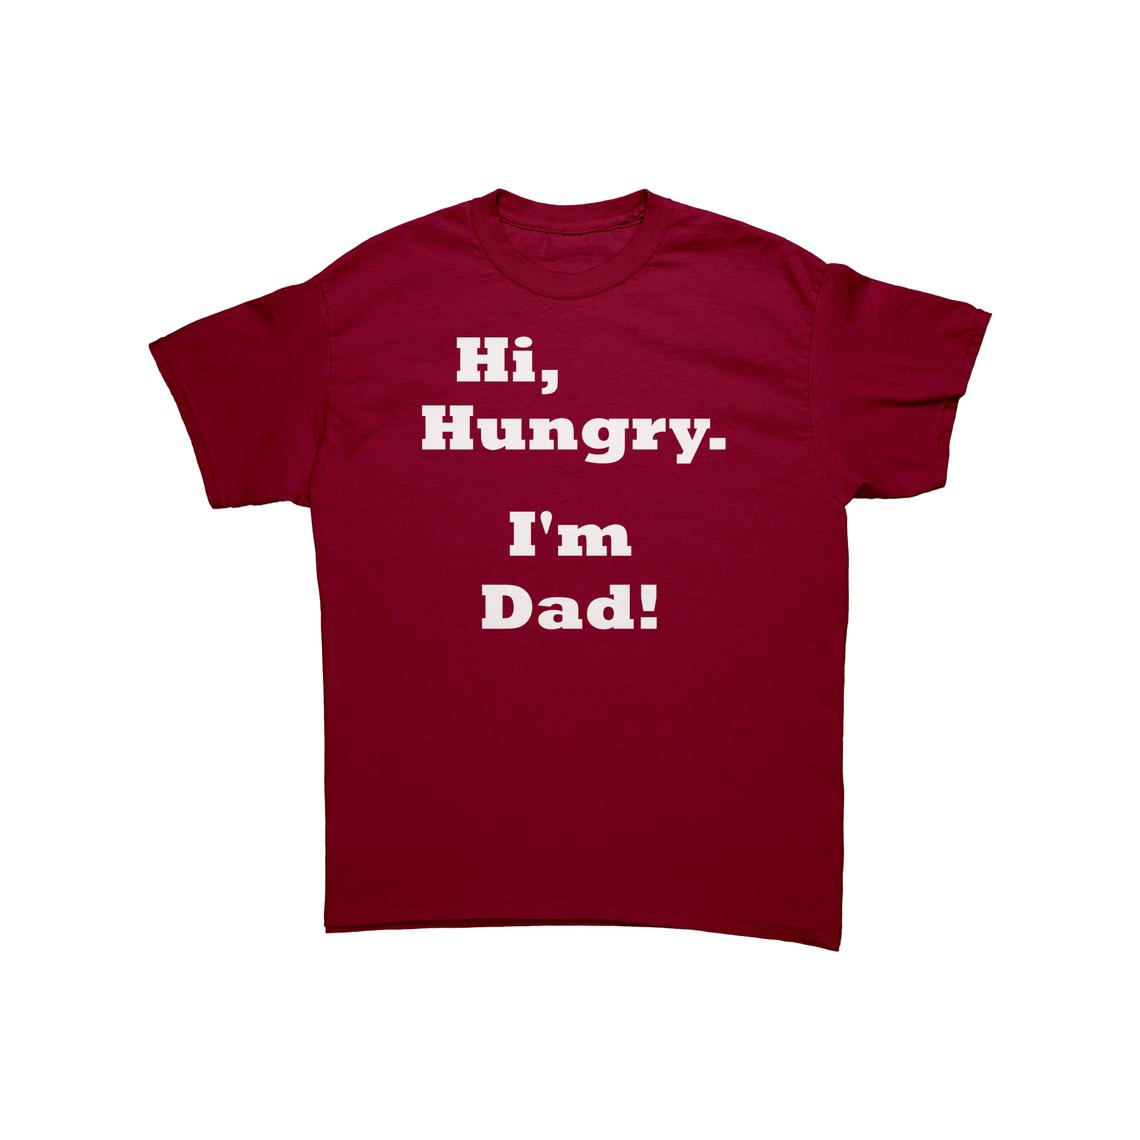 http://Hi%20Hungry%20Dark%20T-Shirt